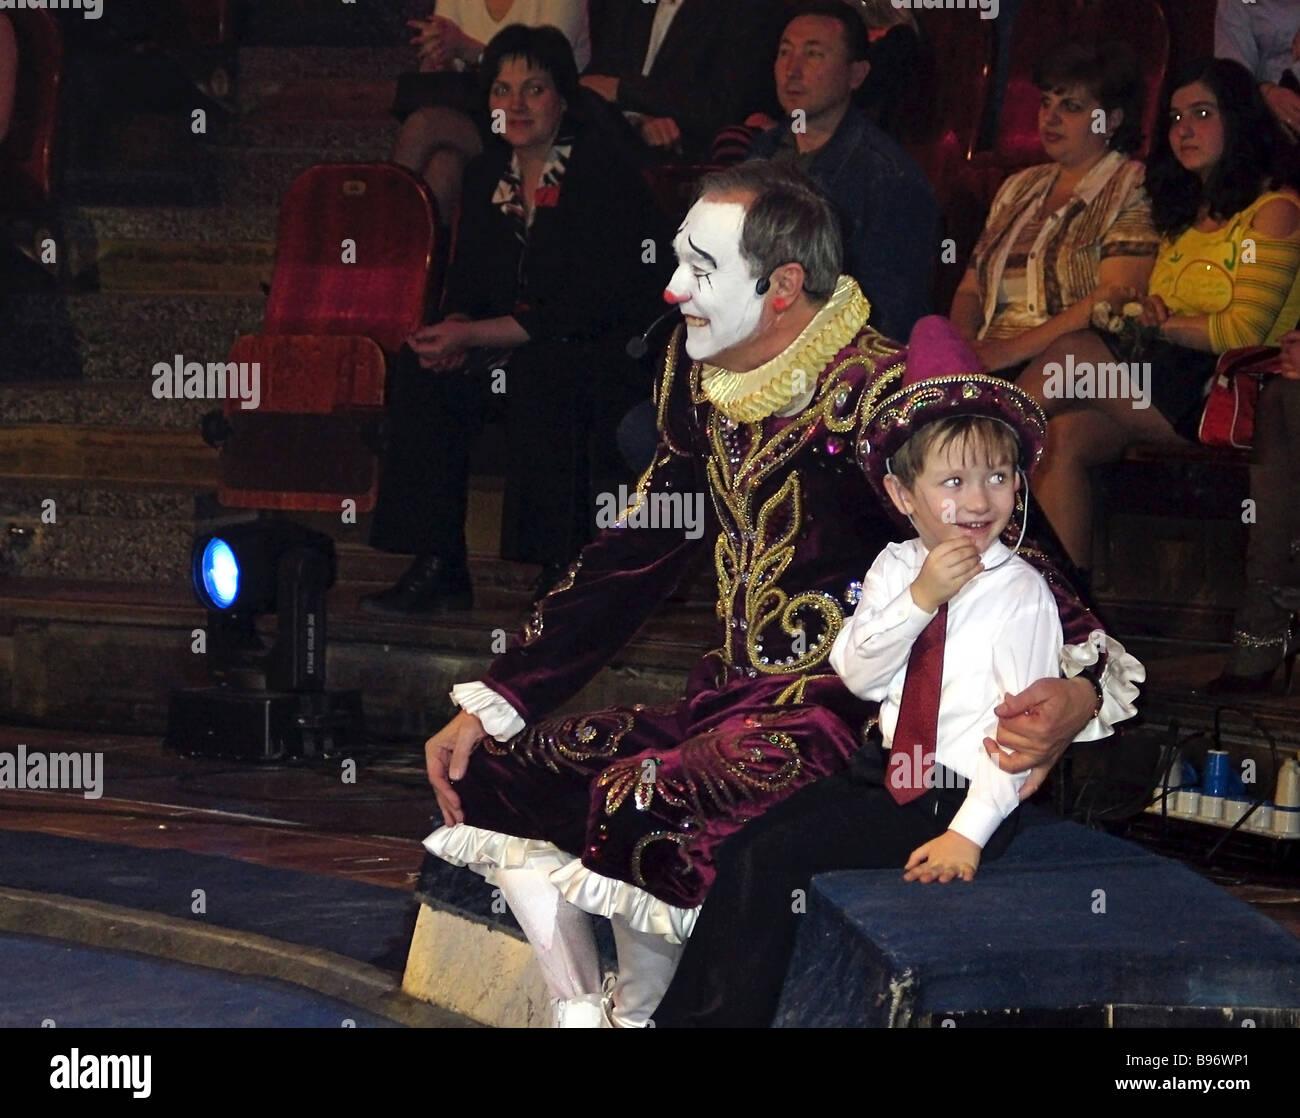 Oleg Yankovsky Russian film star Lenkom Theatre leading man and Kinotavr film festival president appears as a clown - Stock Image